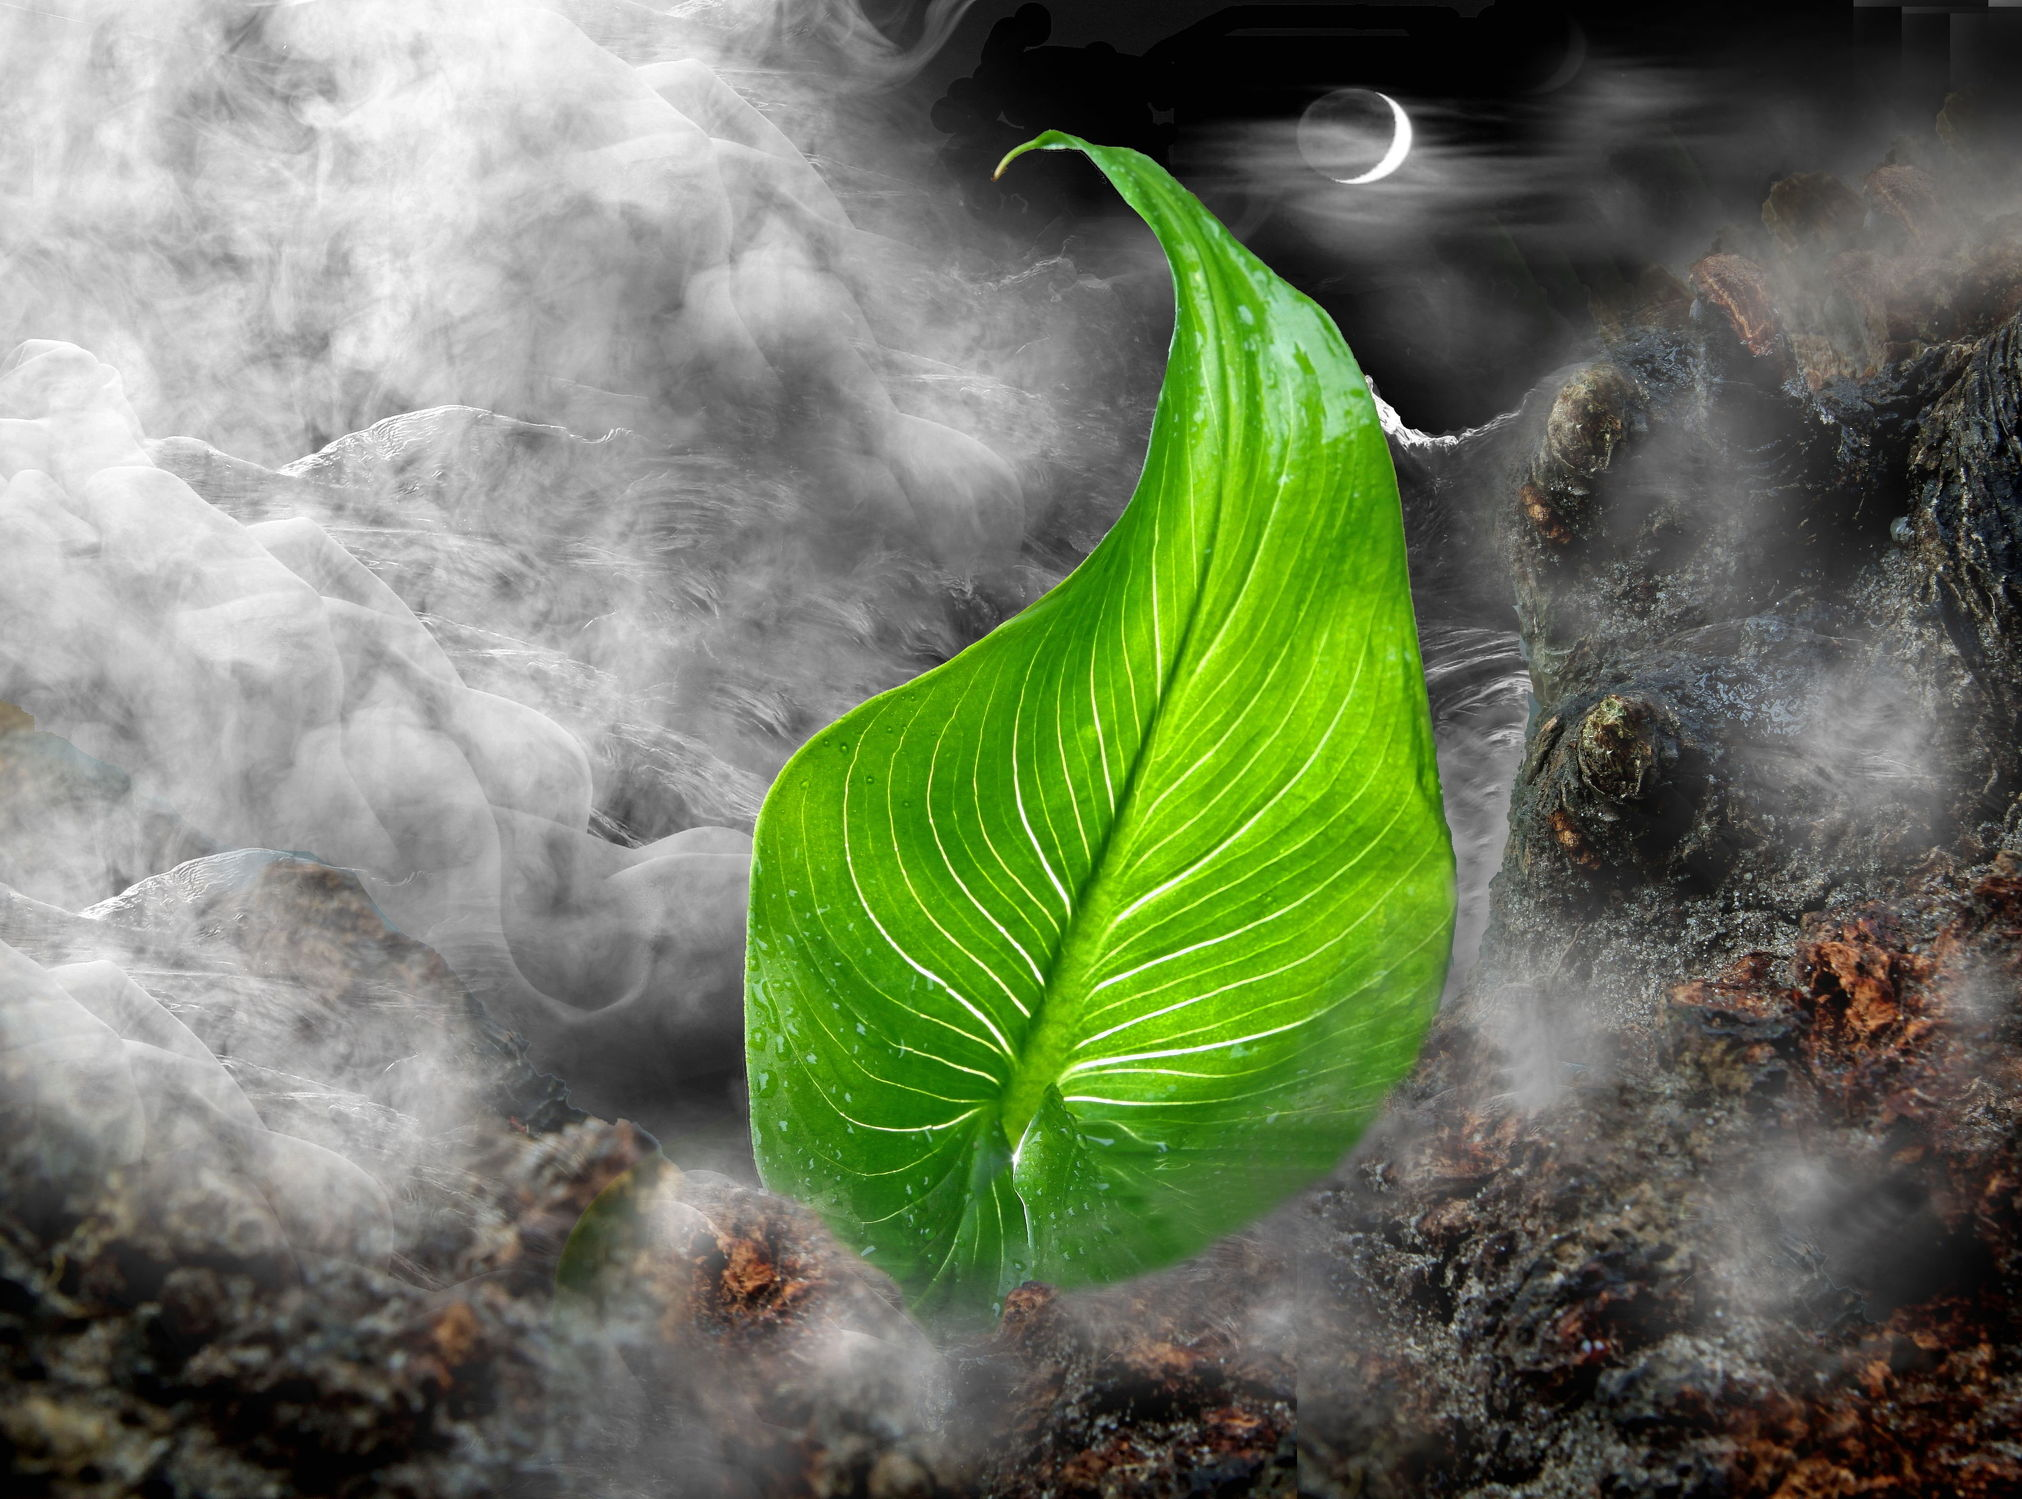 Bild mit Natur, Pflanzen, Himmel, Wolken, Nebel, Blätter, Pflanze, Blatt, Fauna, Gebirge